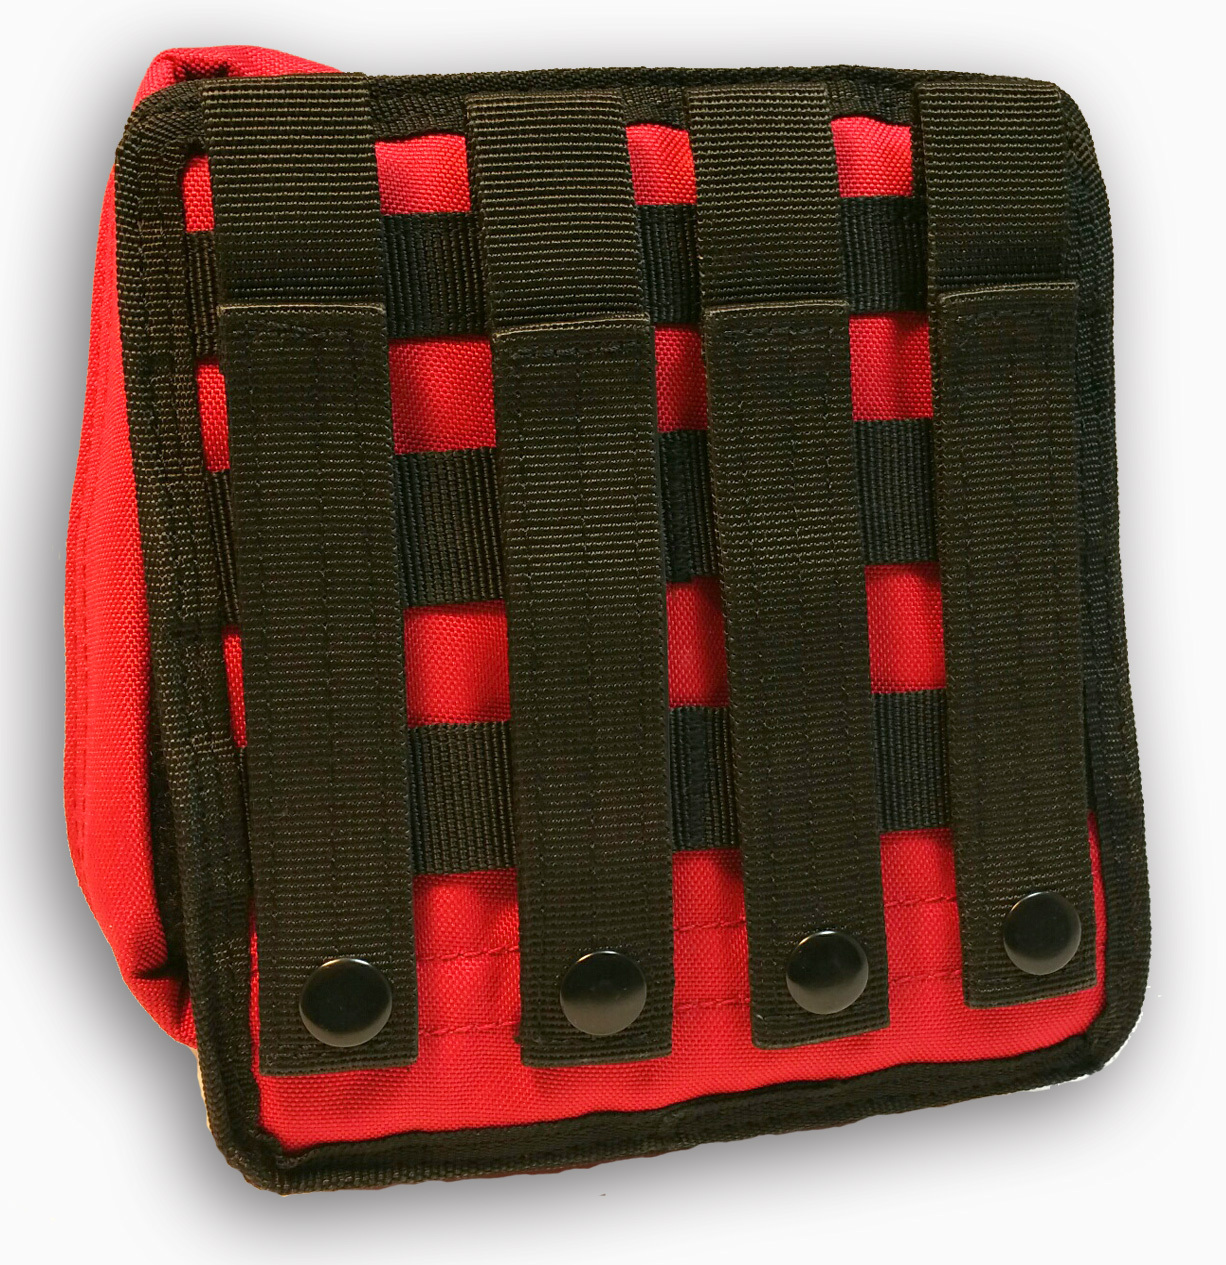 rtf-chest-pouch-back.jpg